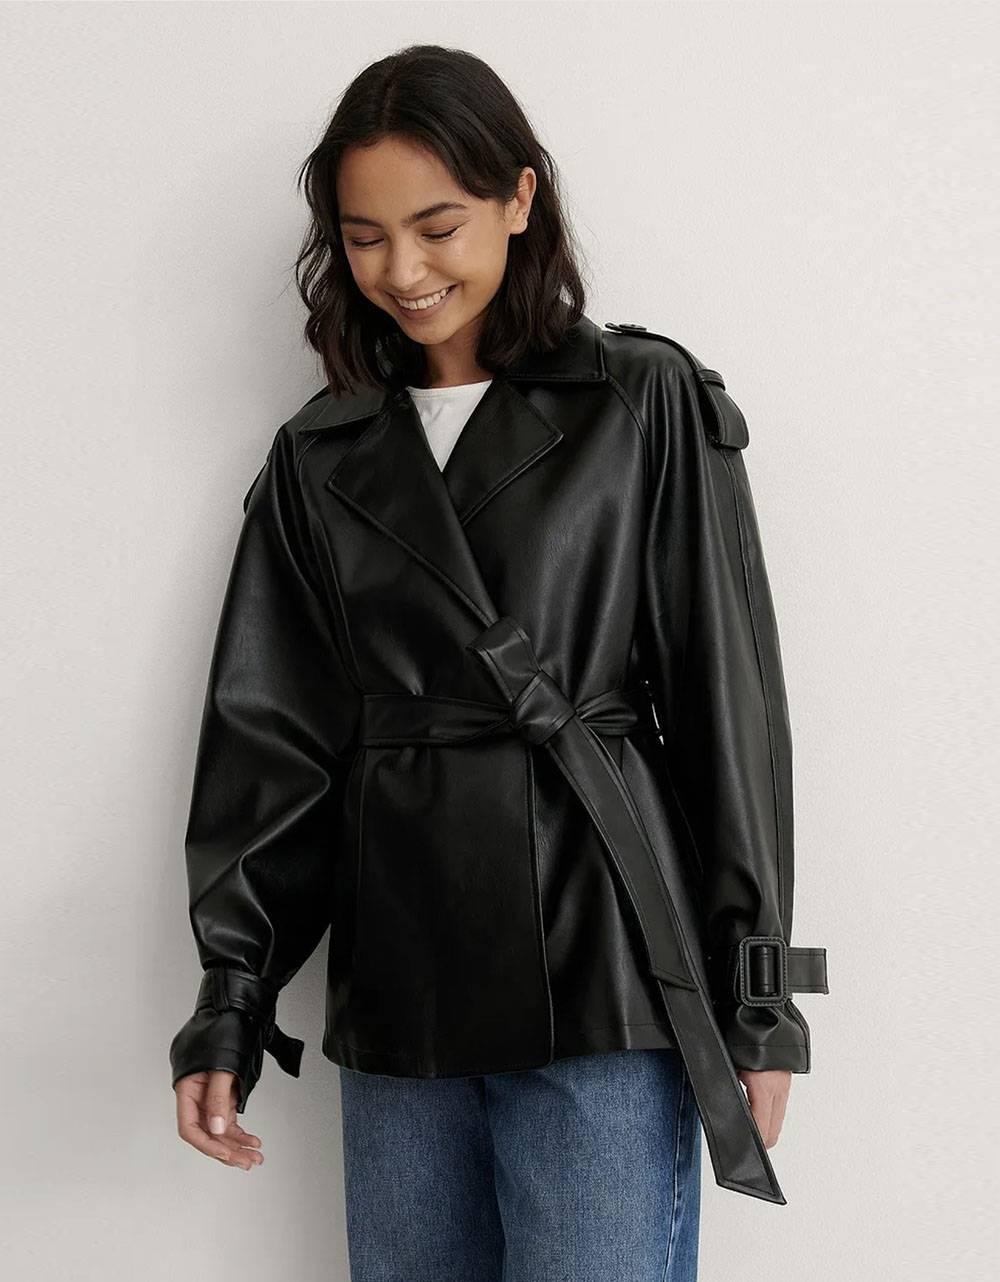 NA-KD belted pu jacket - black NA-KD Jacket 95,00€